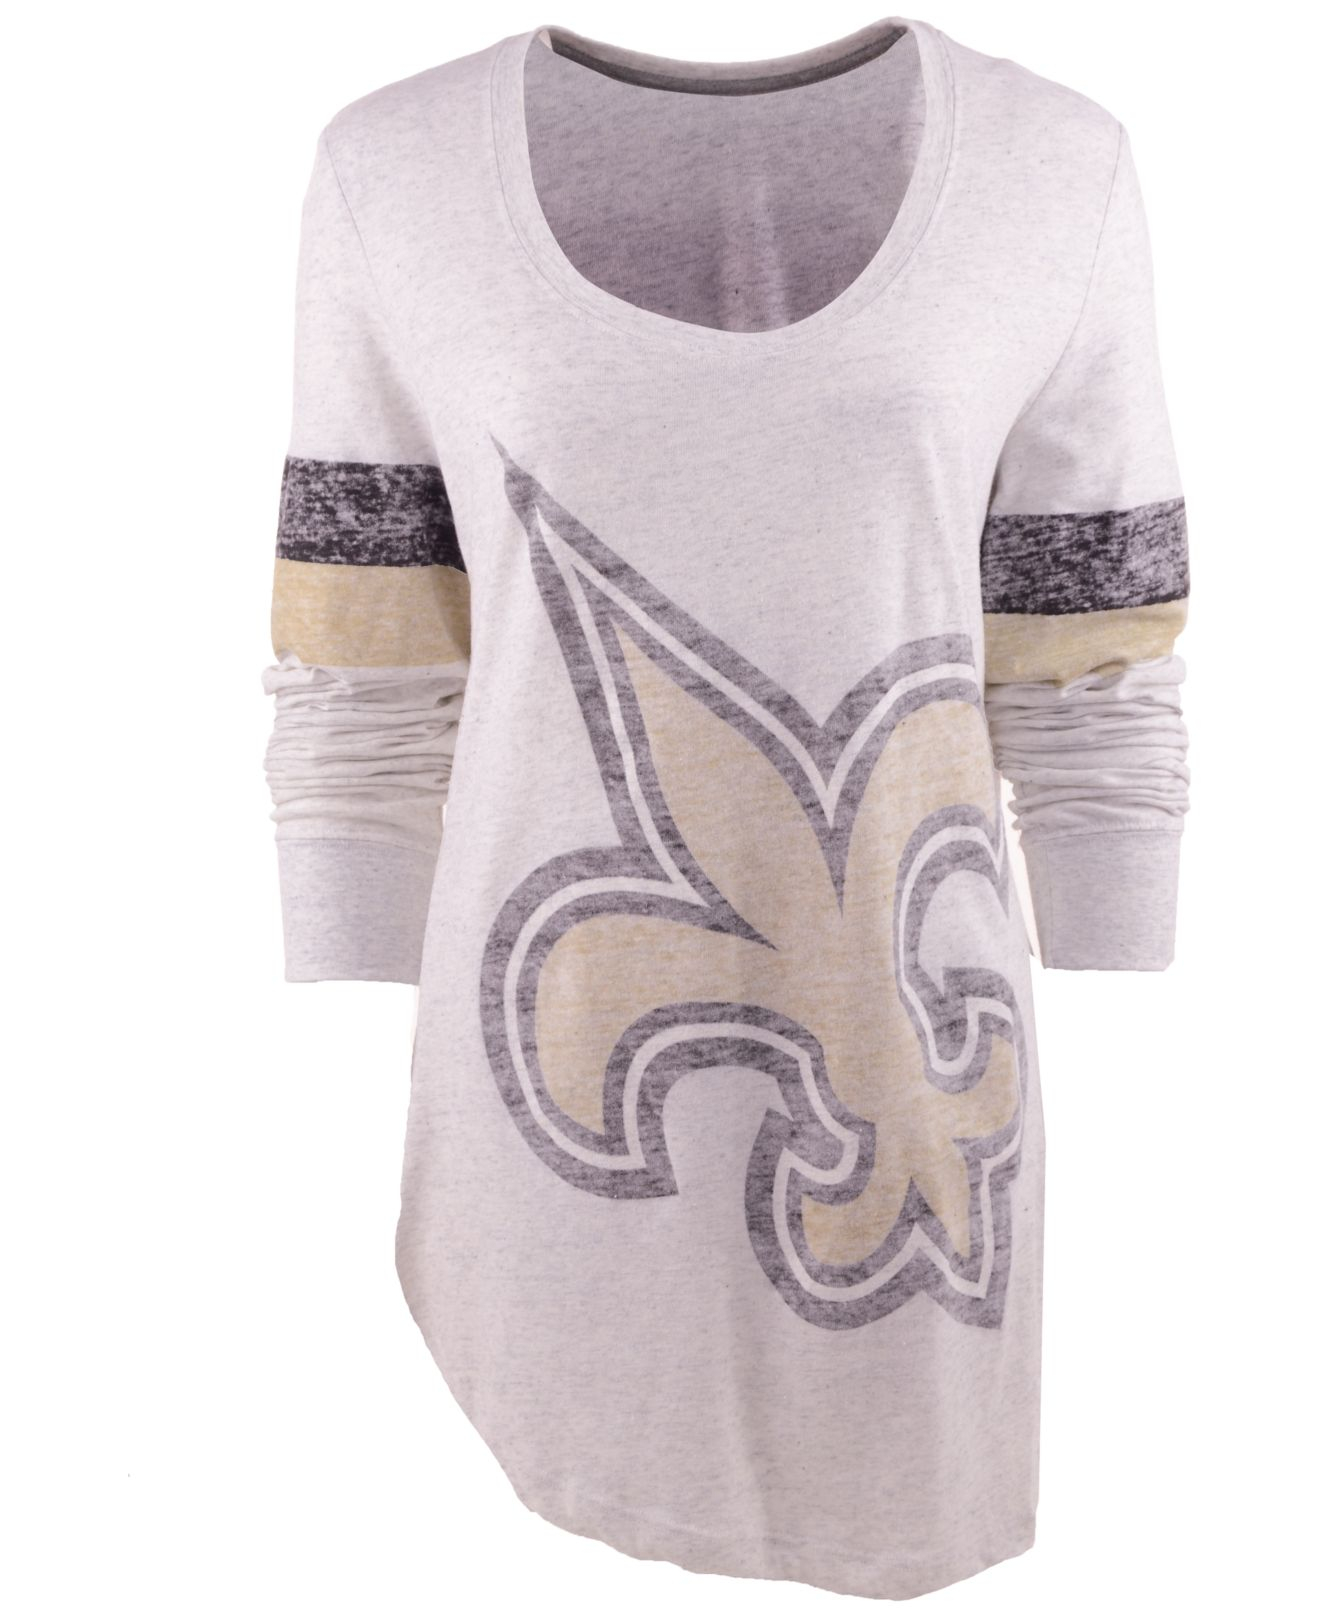 2e8fd398 Nike Women's Long-sleeve New Orleans Saints T-shirt in White - Lyst